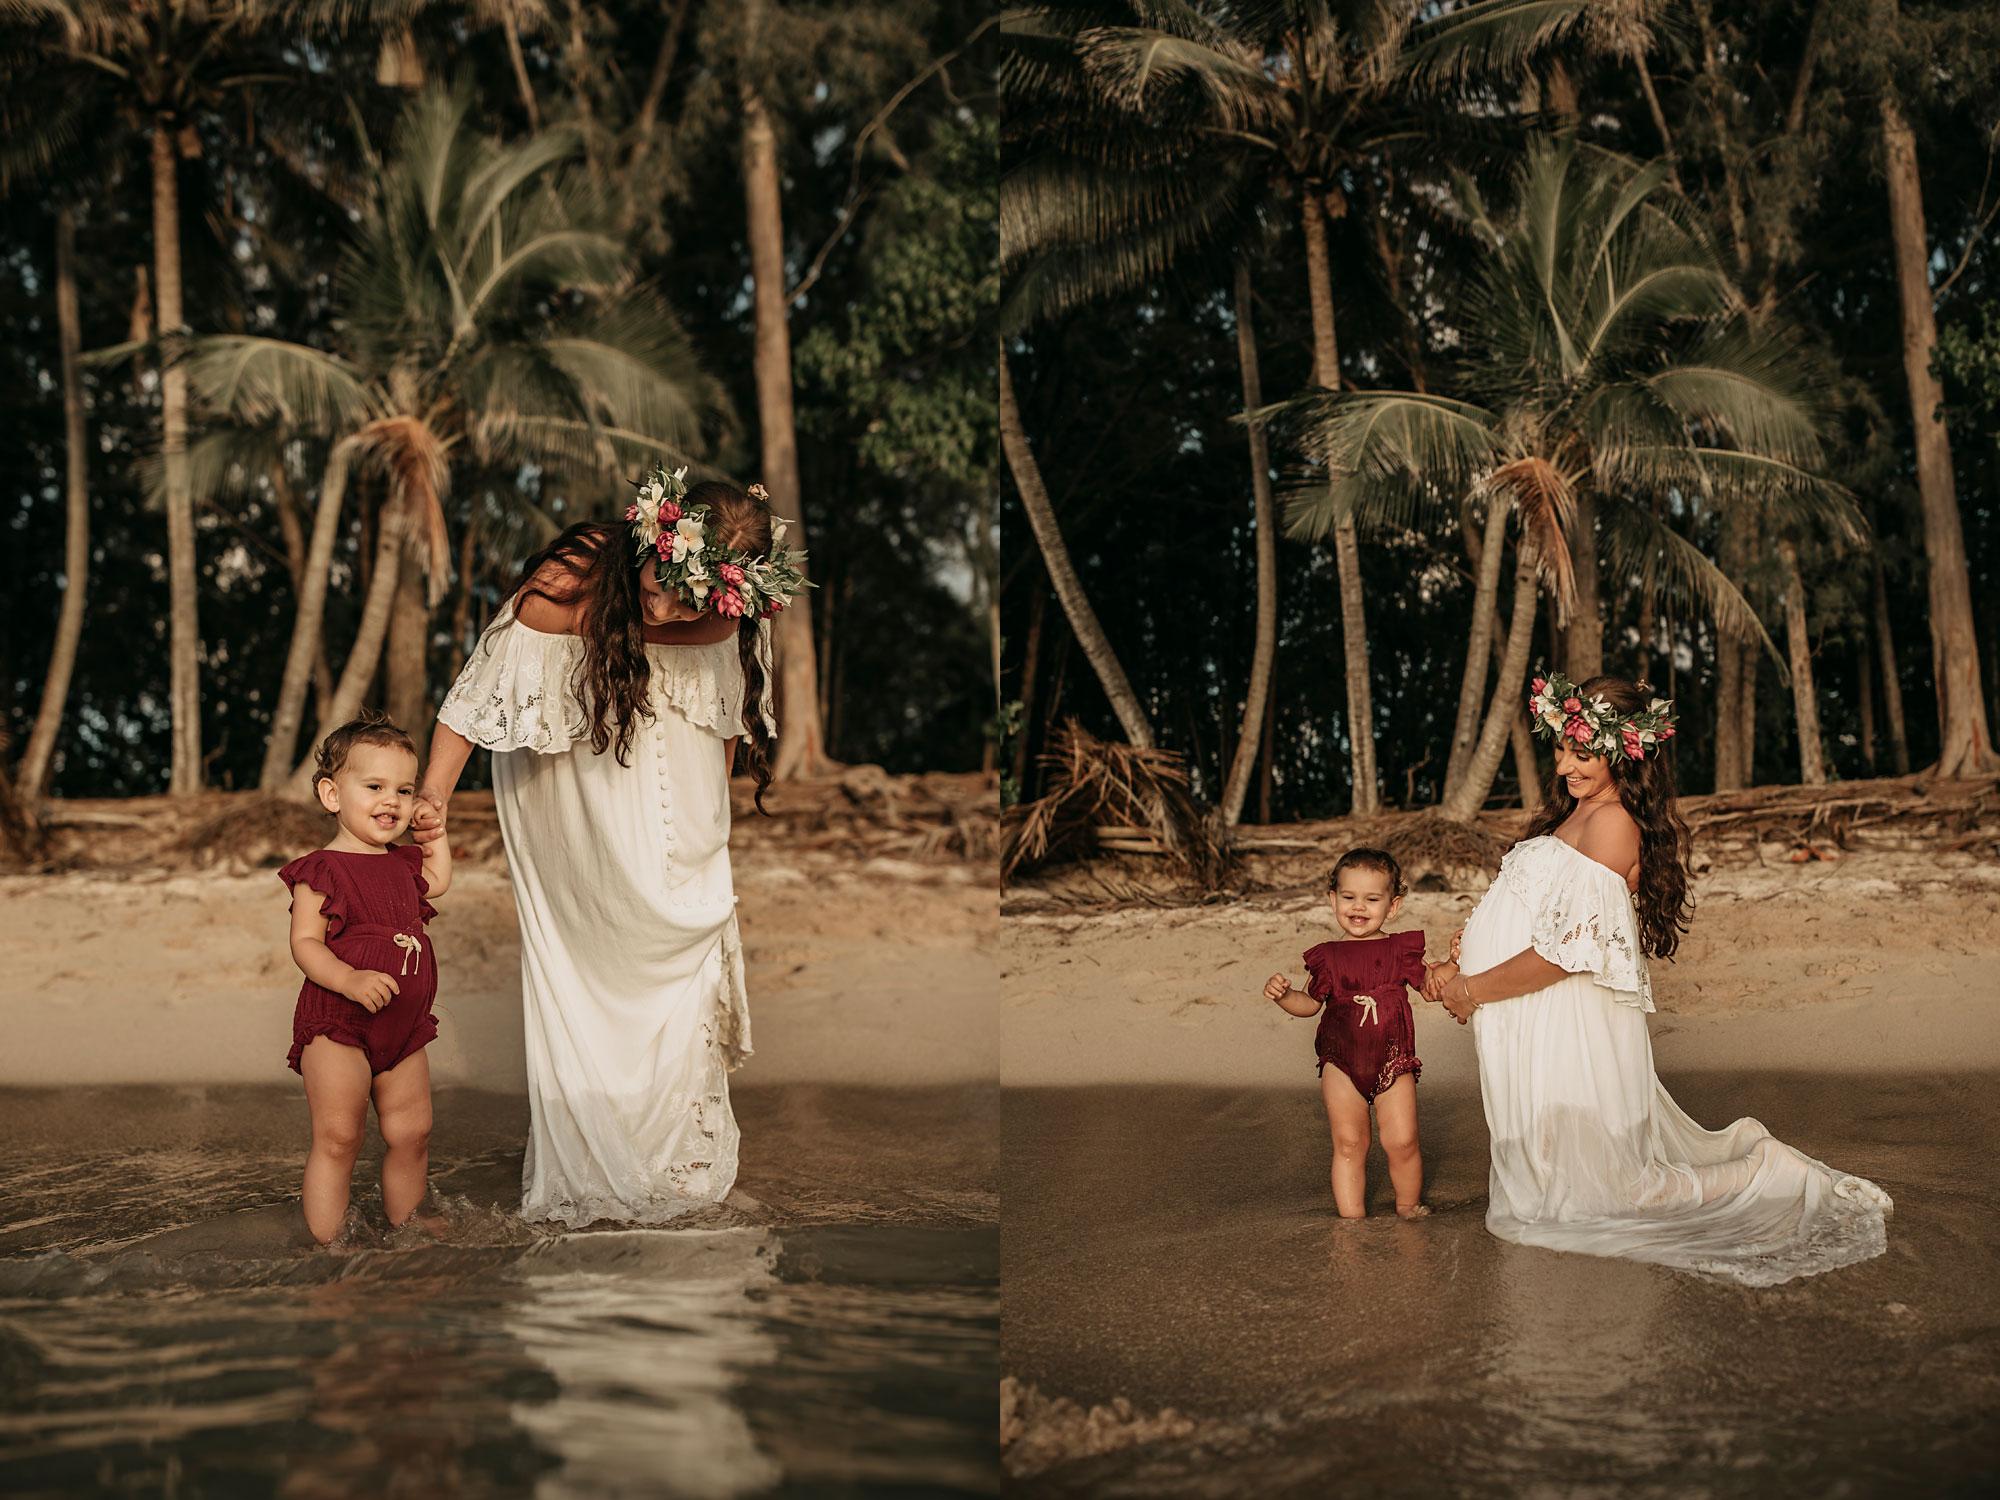 Hawaii-Oahu-Maternity-Photography-The-Sophia-Co-017.jpg